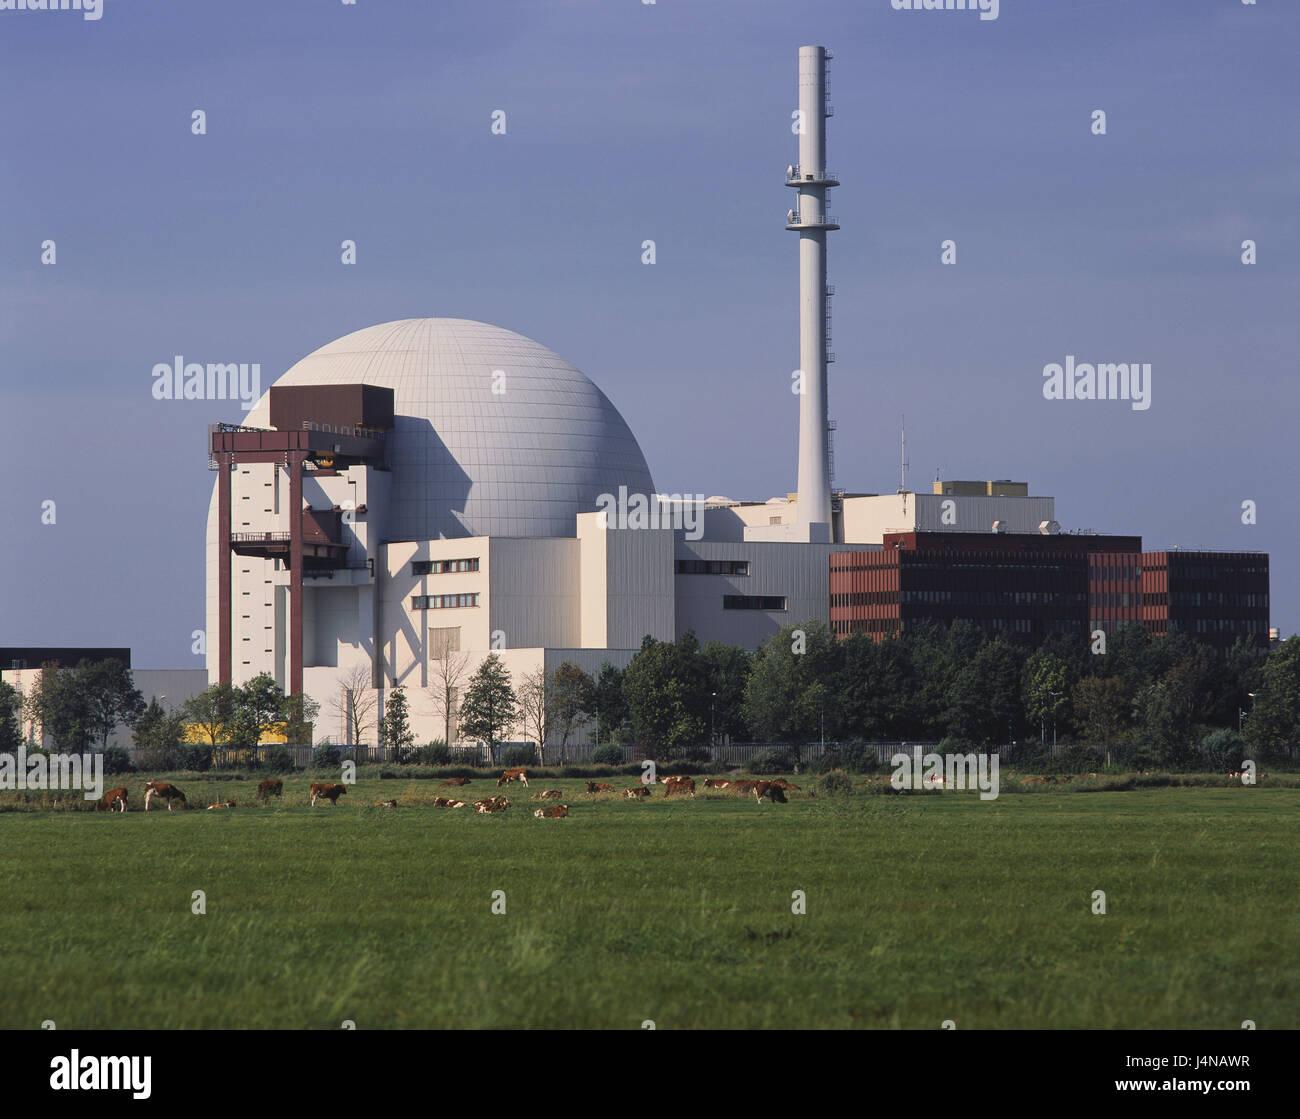 Germany, Schleswig - Holstein, Brunsbuttel, nuclear power plant village Brok, North Germany, atomic power station, - Stock Image